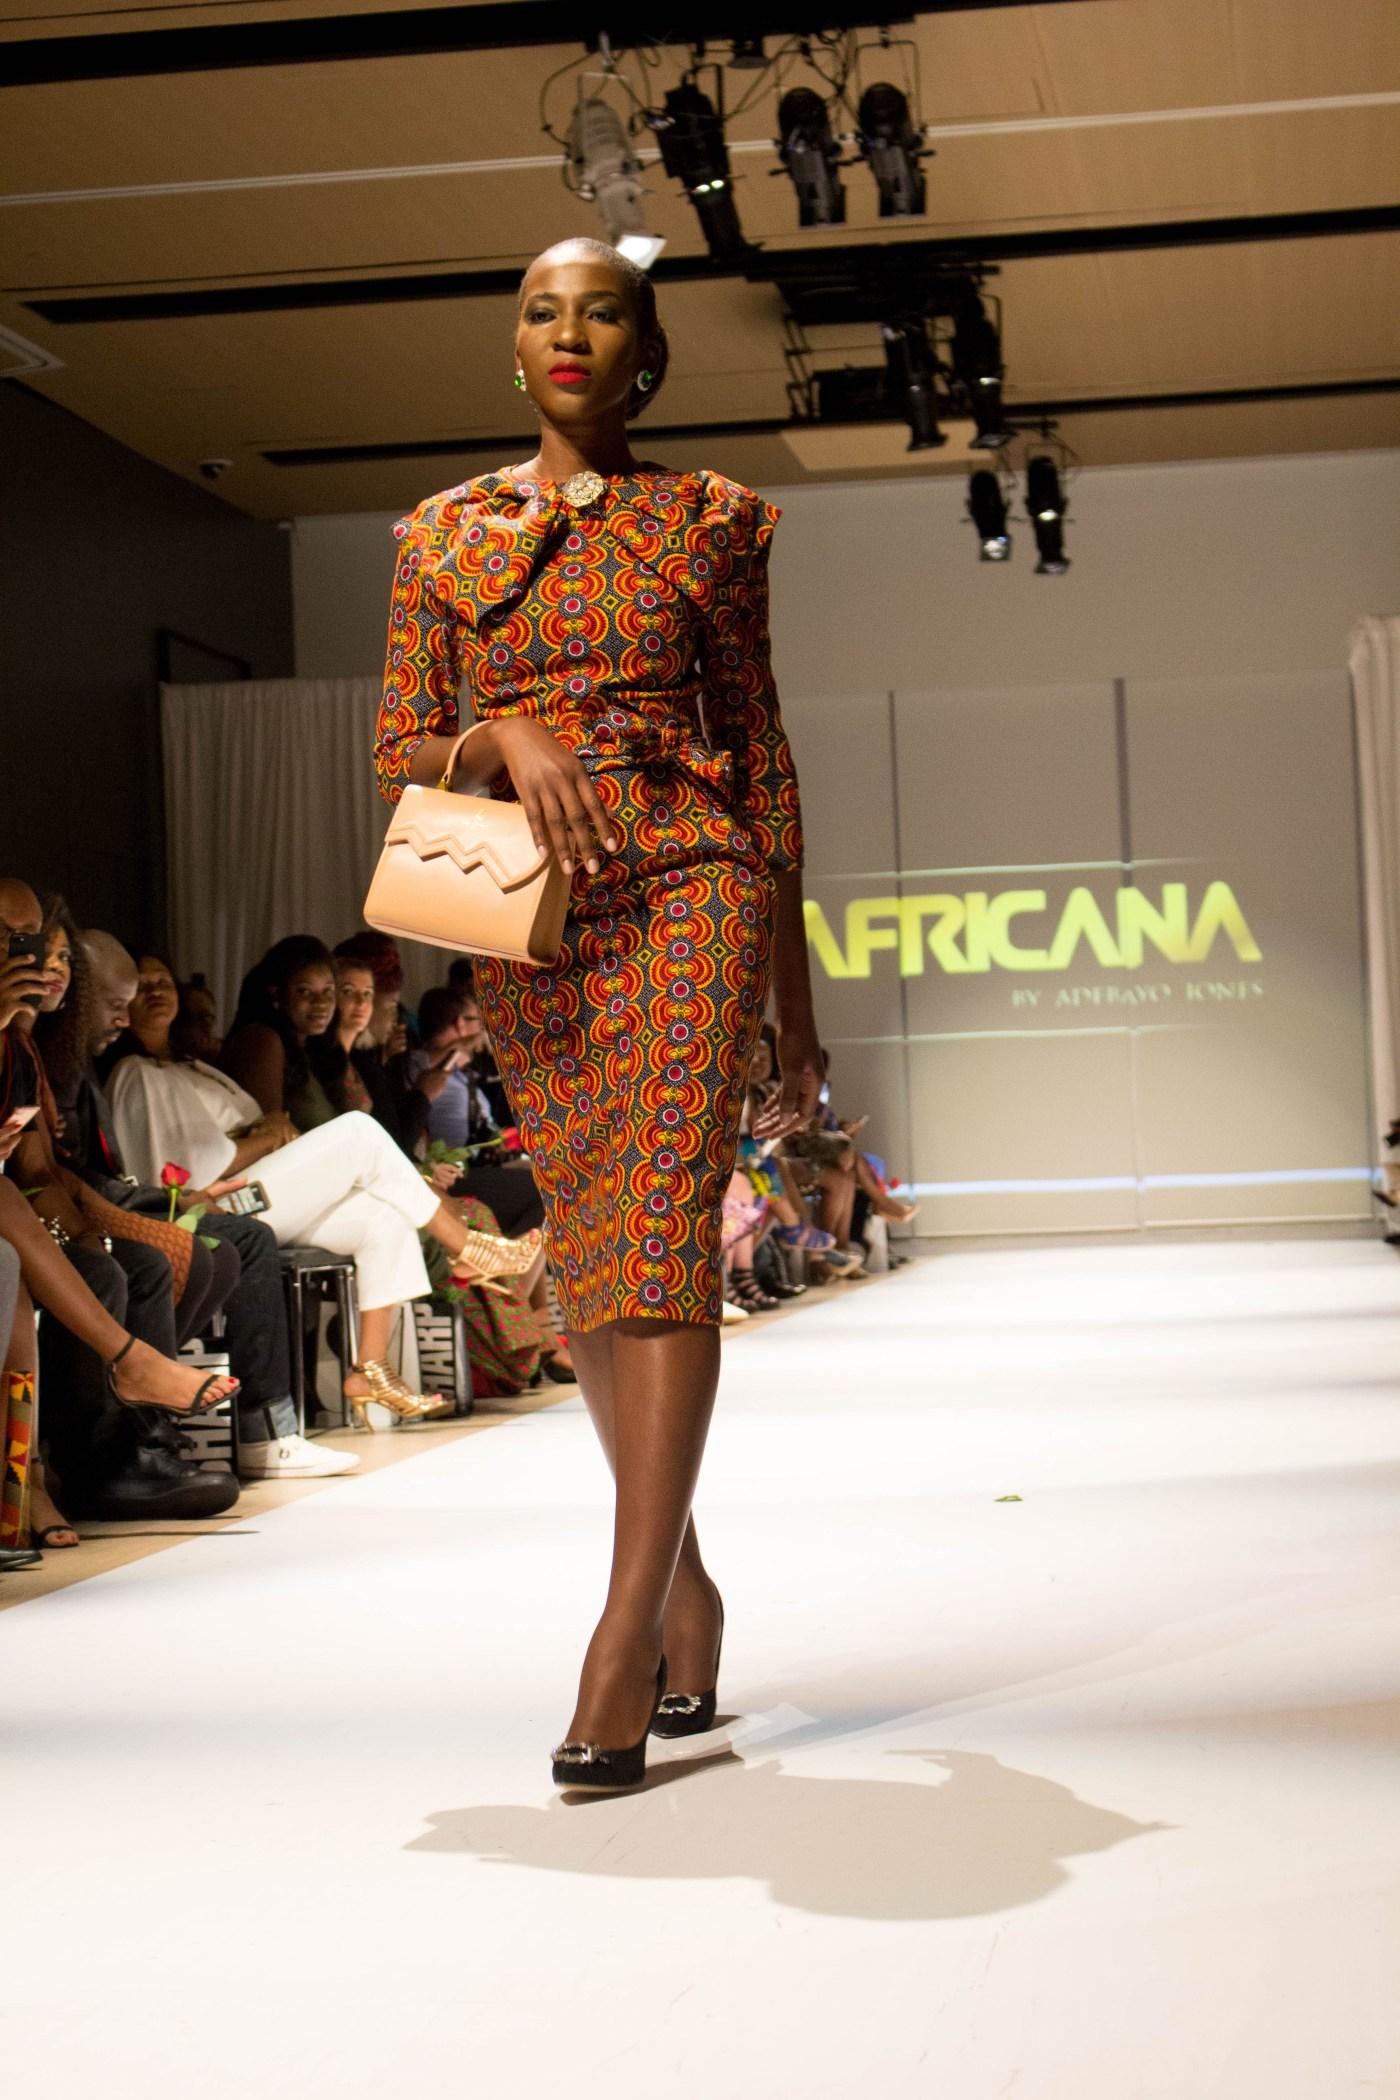 e0b88d8ce6d5 African Fashion Week 2018: Recap - Fashion Bloggers Toronto